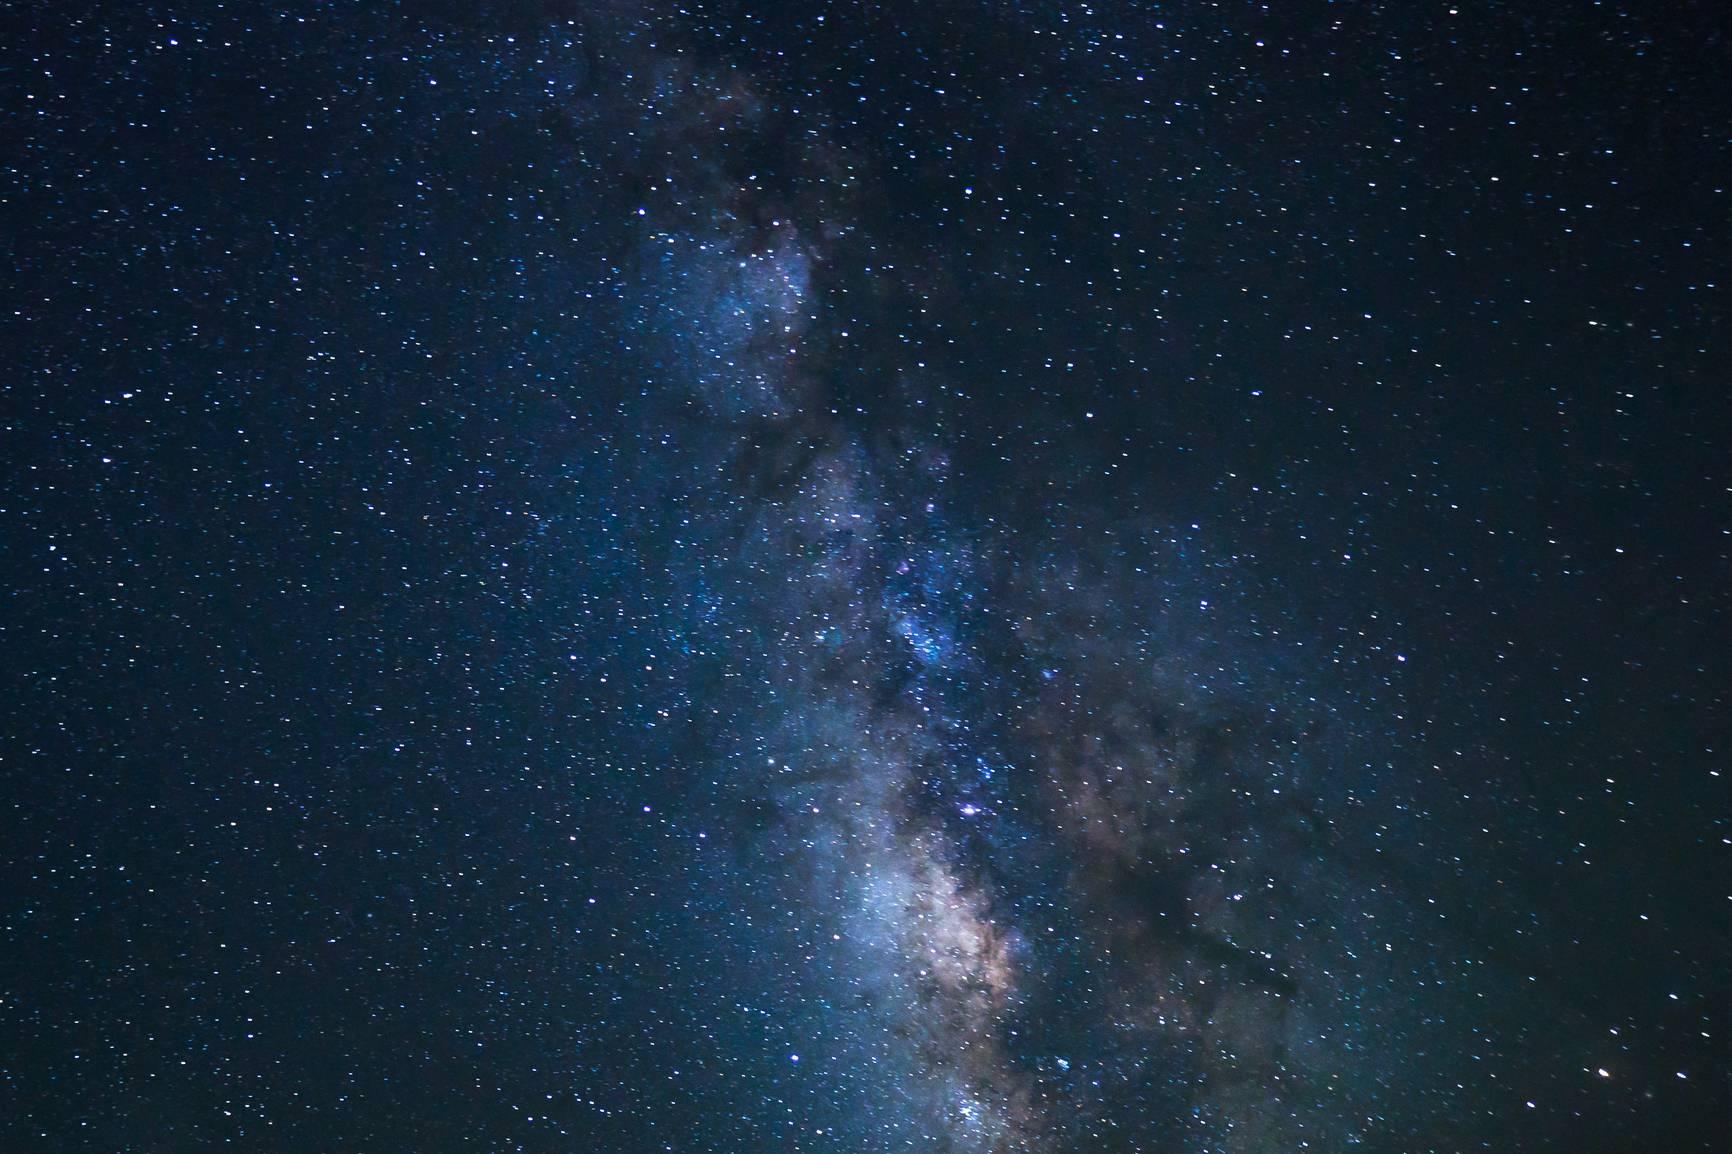 Starry Night Sky Wallpapers 1732x1154